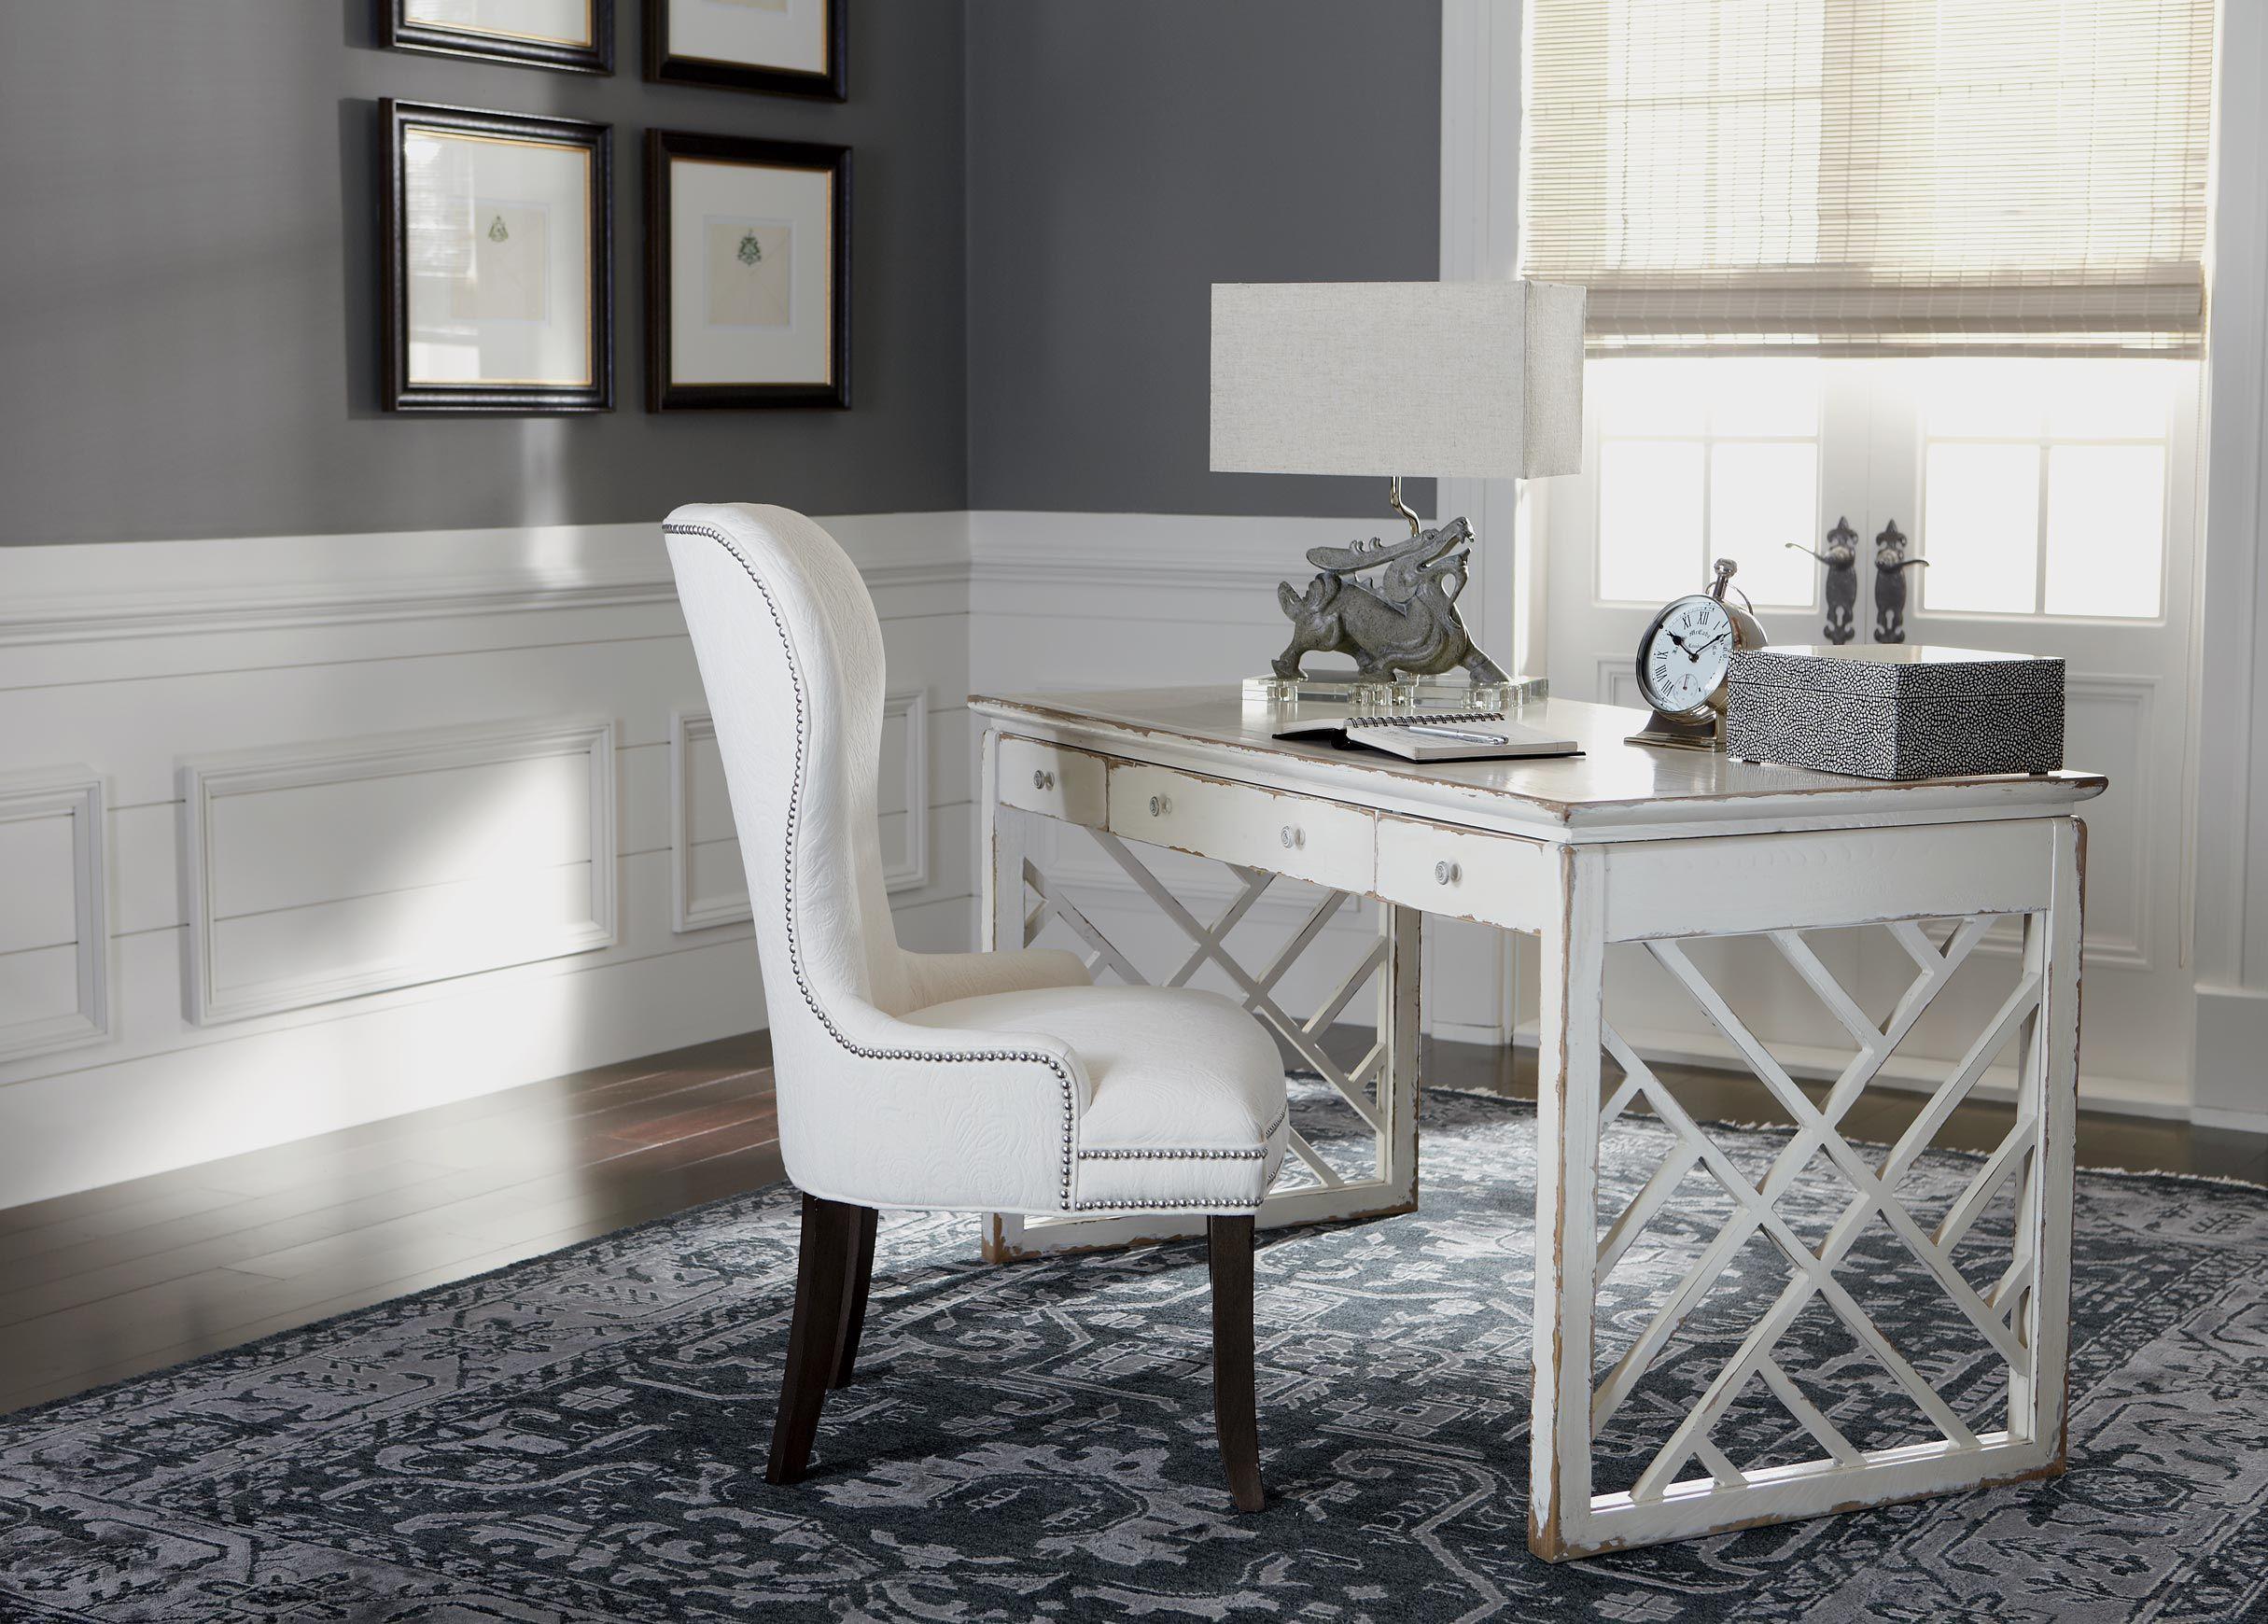 gillian host chair dining chairs ethan allen home decor